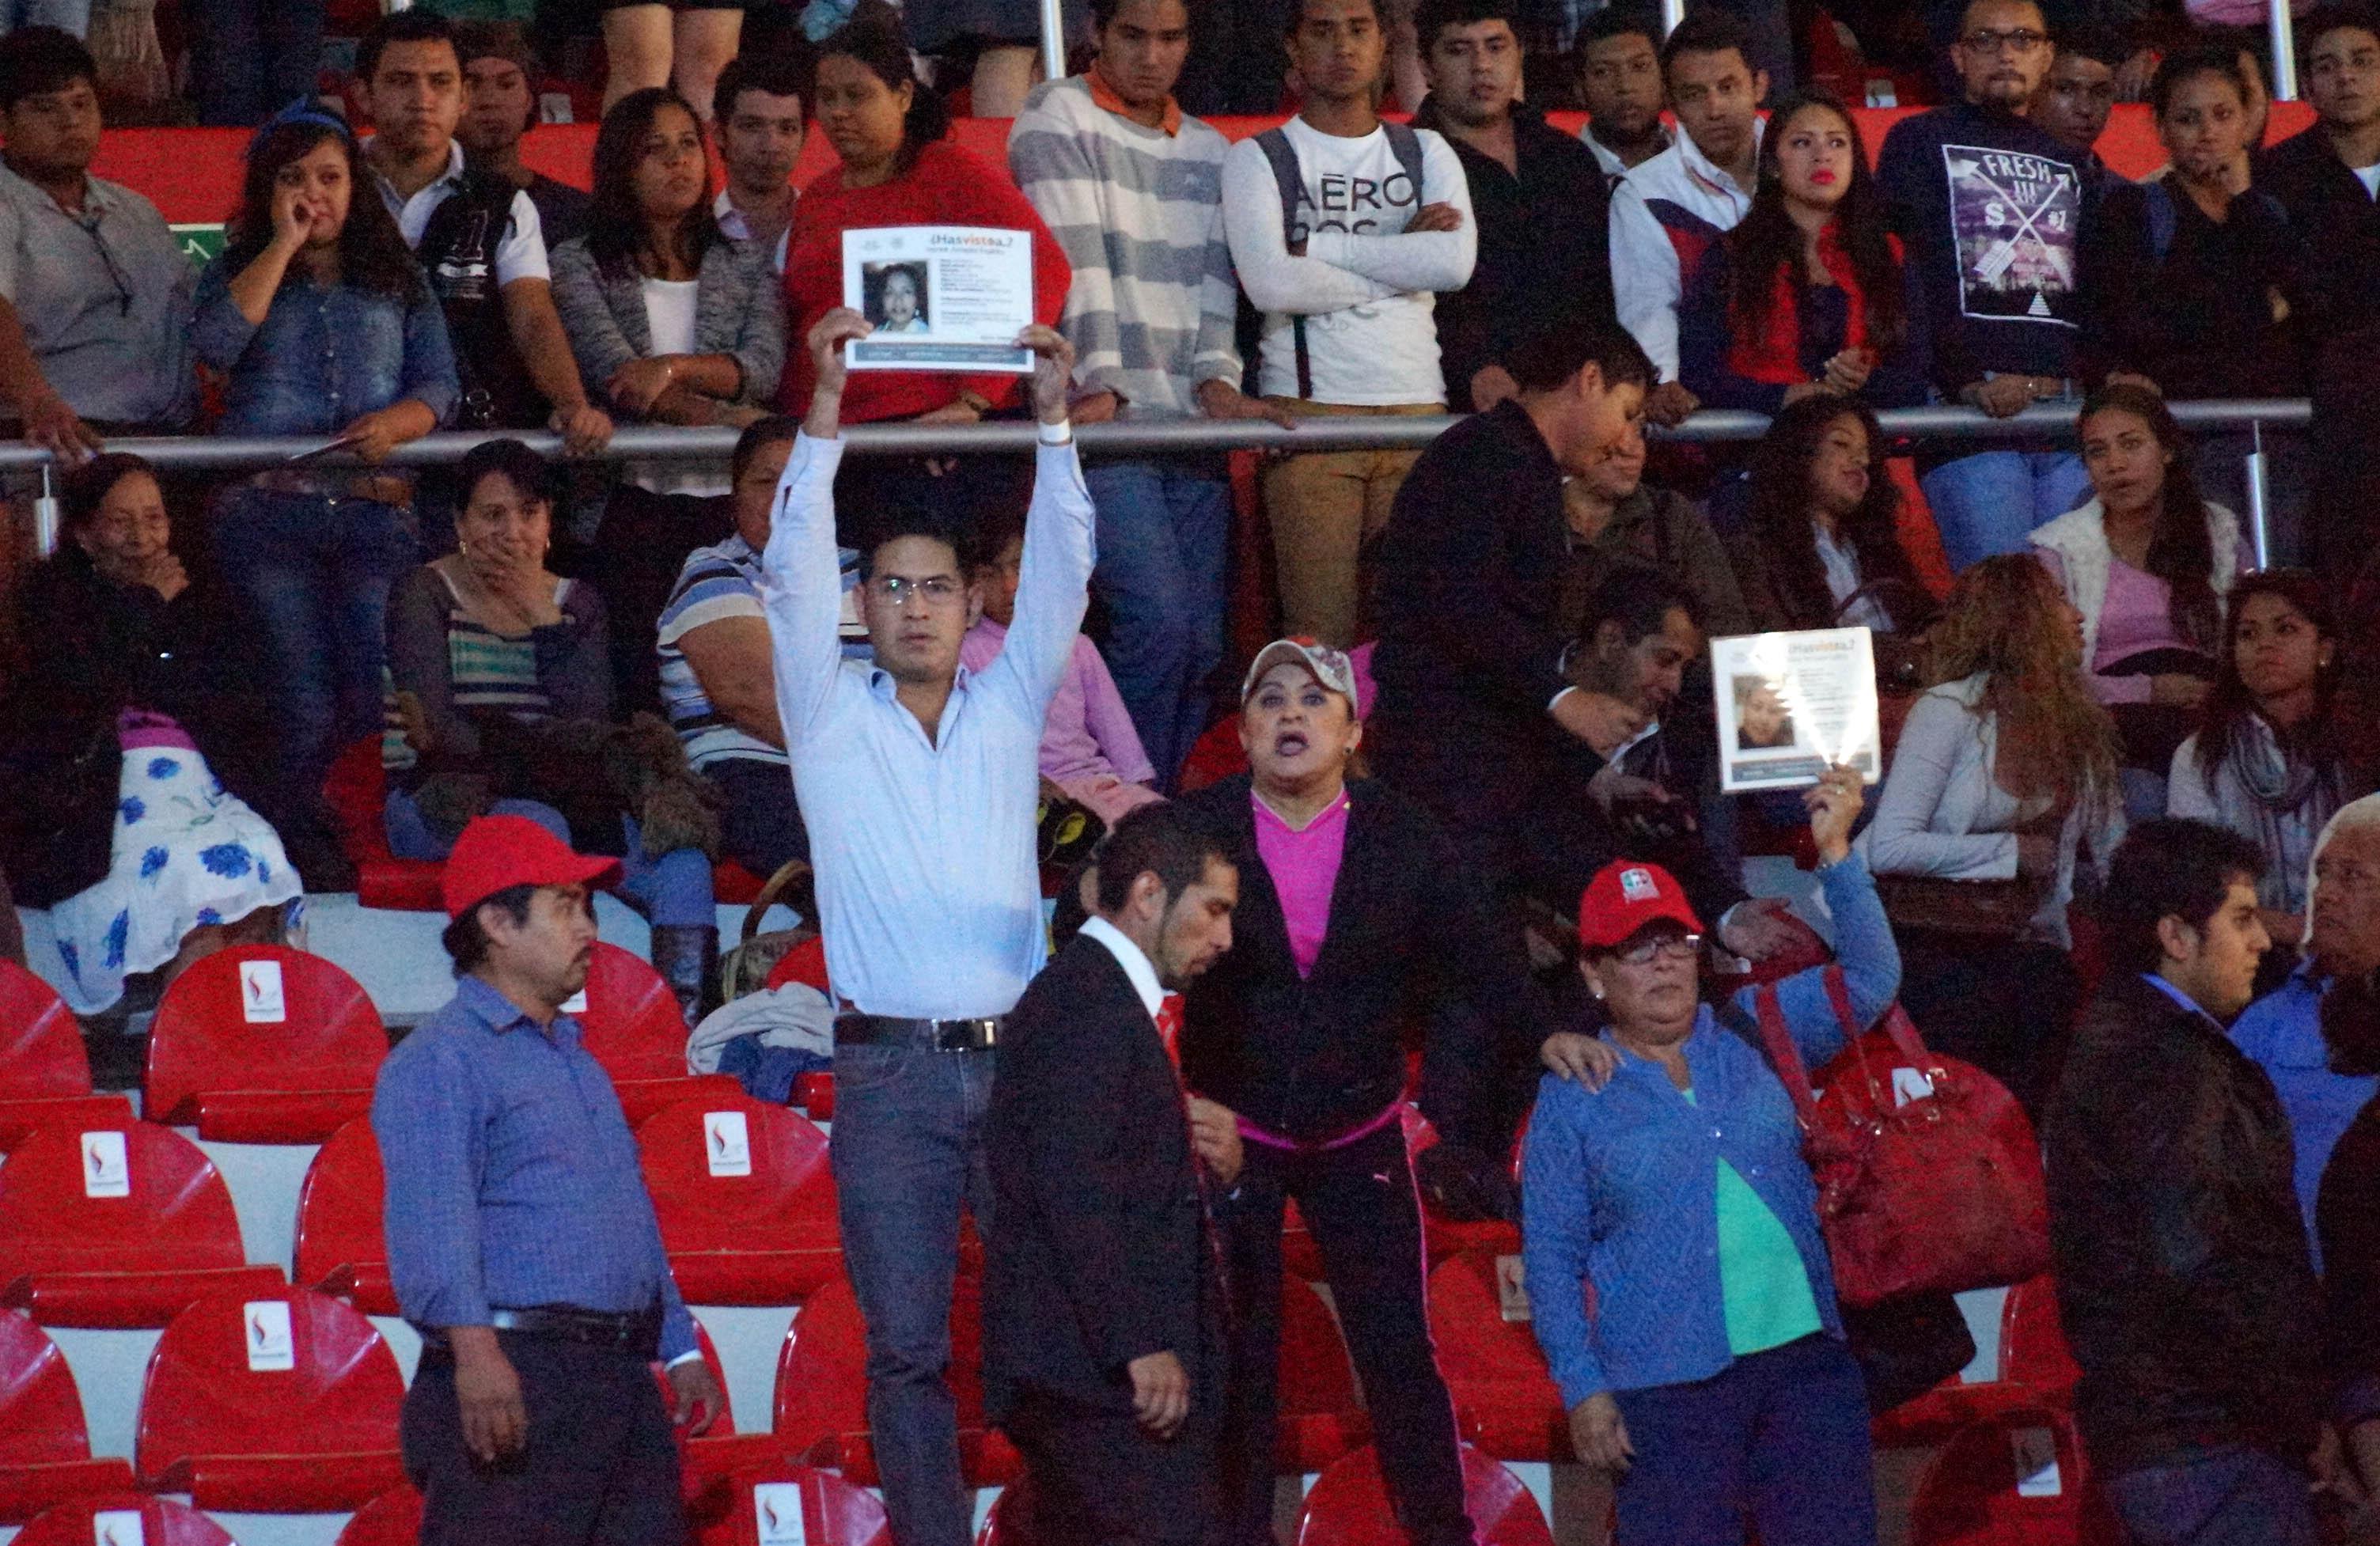 Familiares de desaparecidos protestan en informe de Duarte. Foto: Platanegra.mx